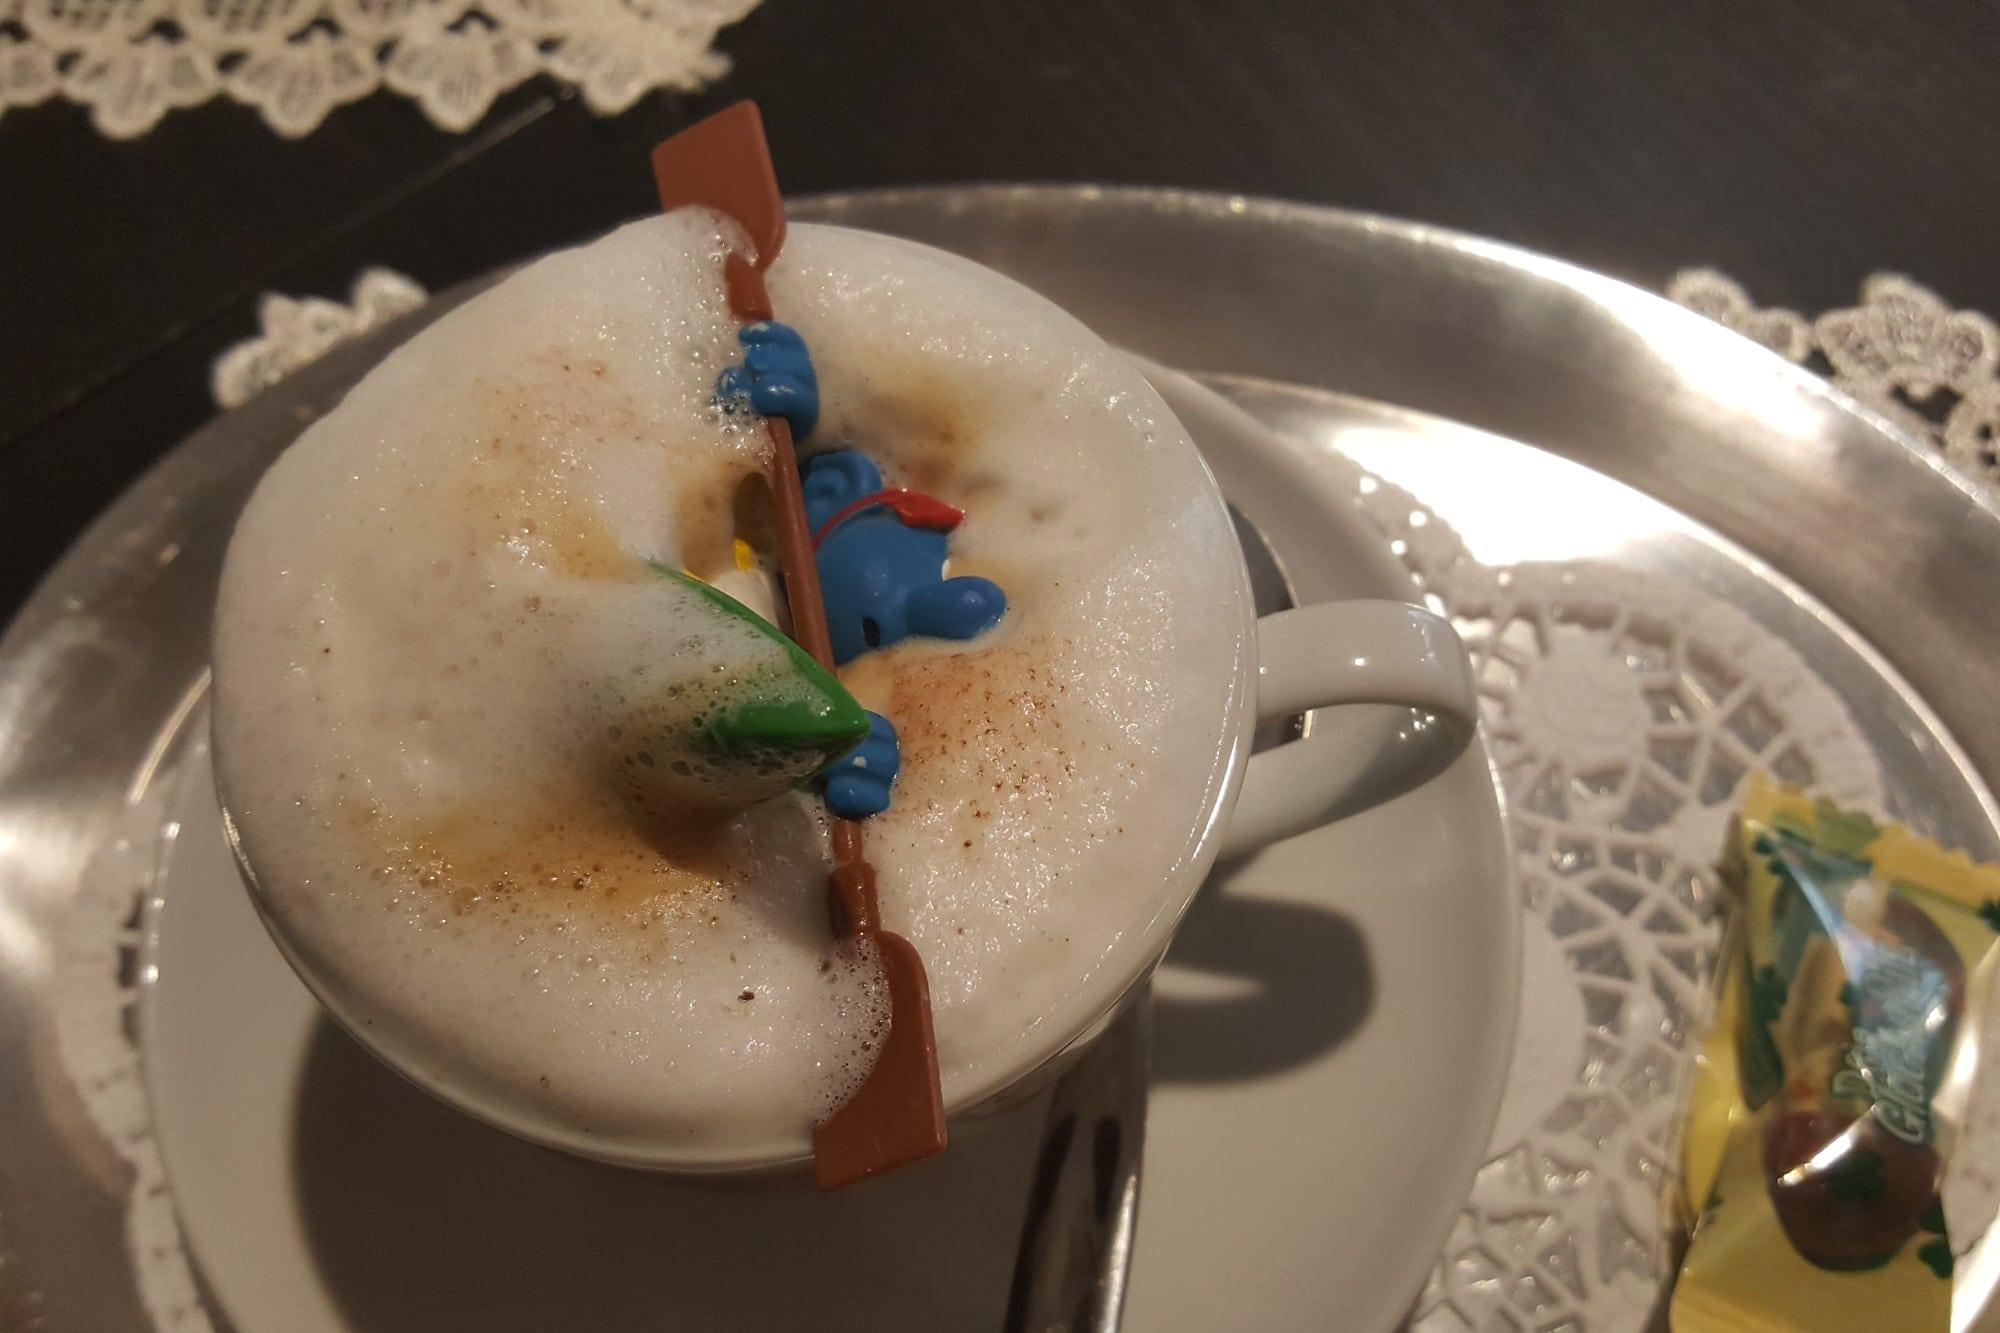 Paddelschlumpf im Cappuccino